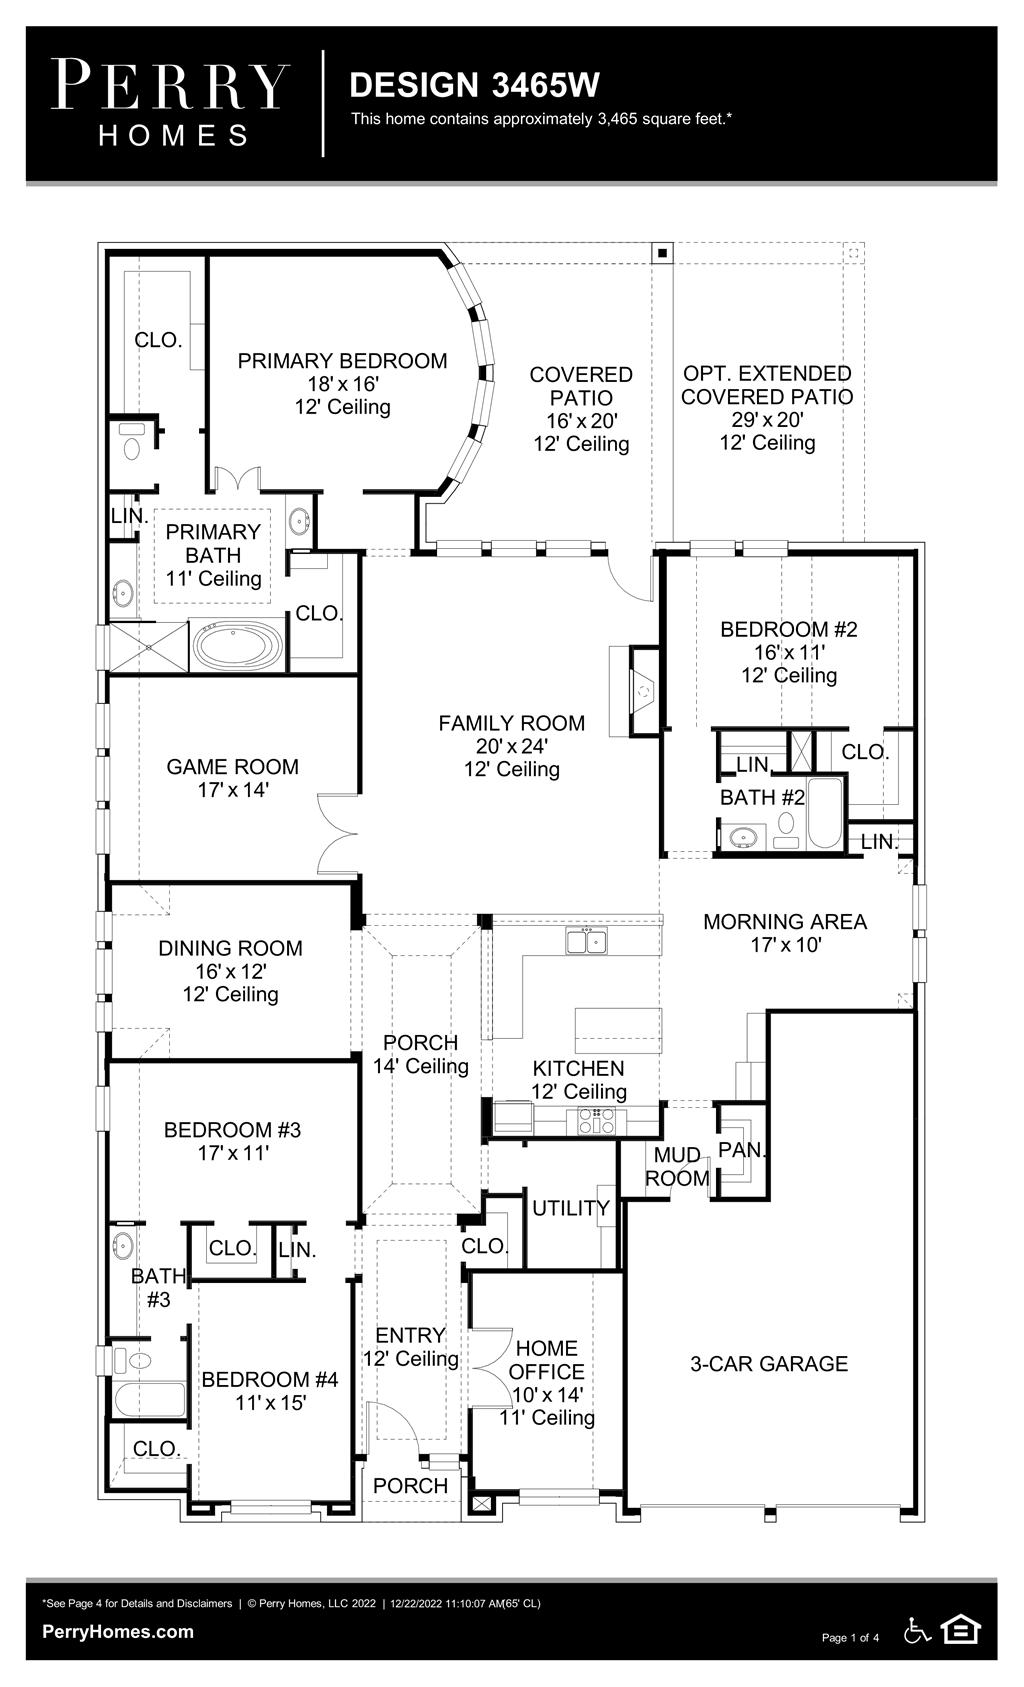 Floor Plan for 3465W